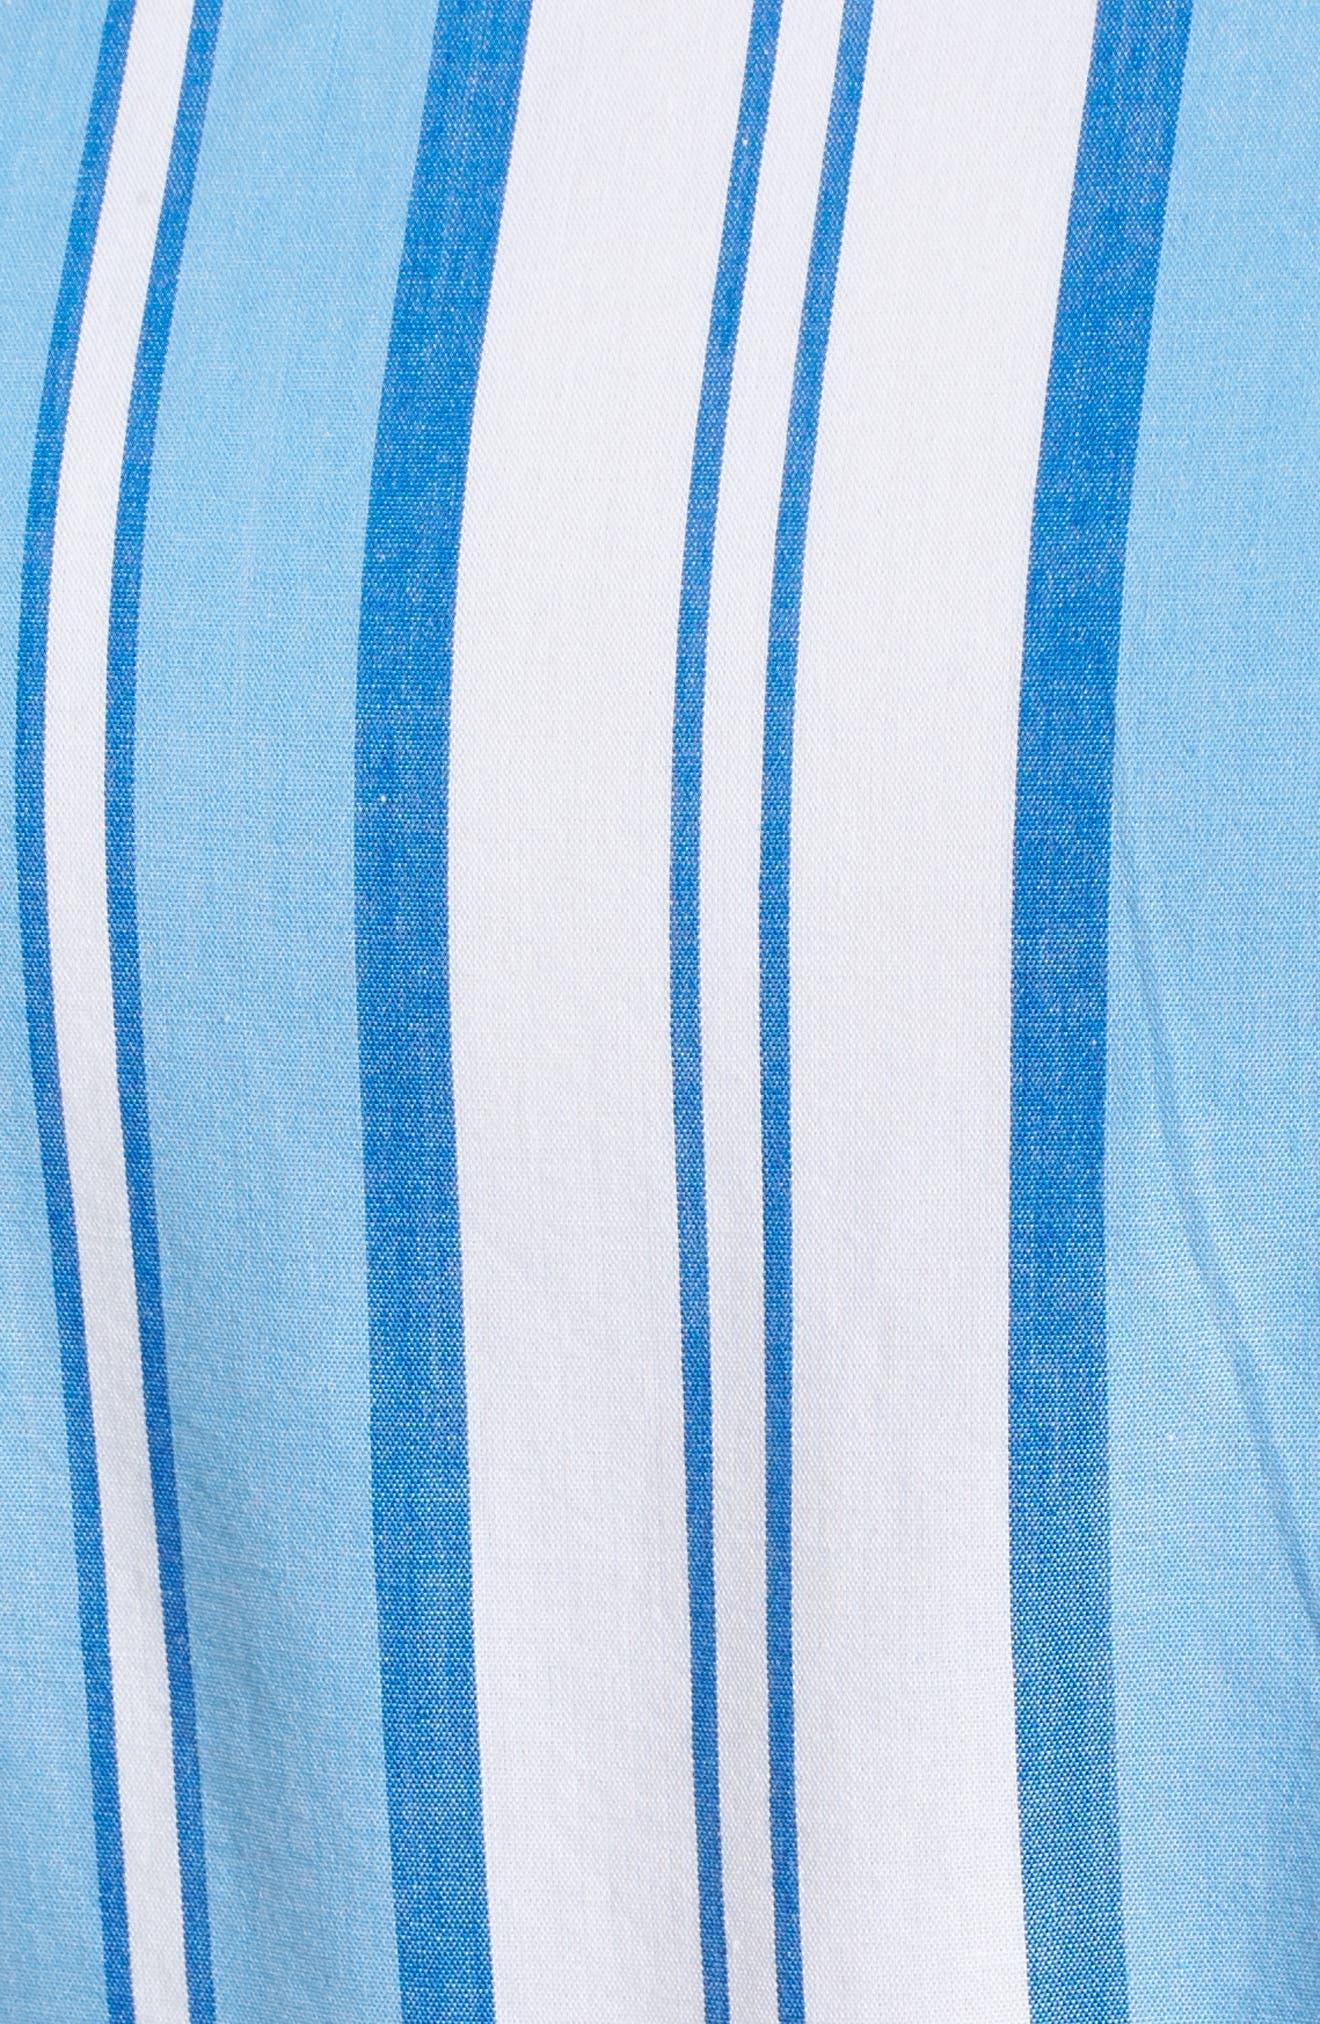 Ocean Stripe Tiered Maxi Dress,                             Alternate thumbnail 5, color,                             Blue Jay